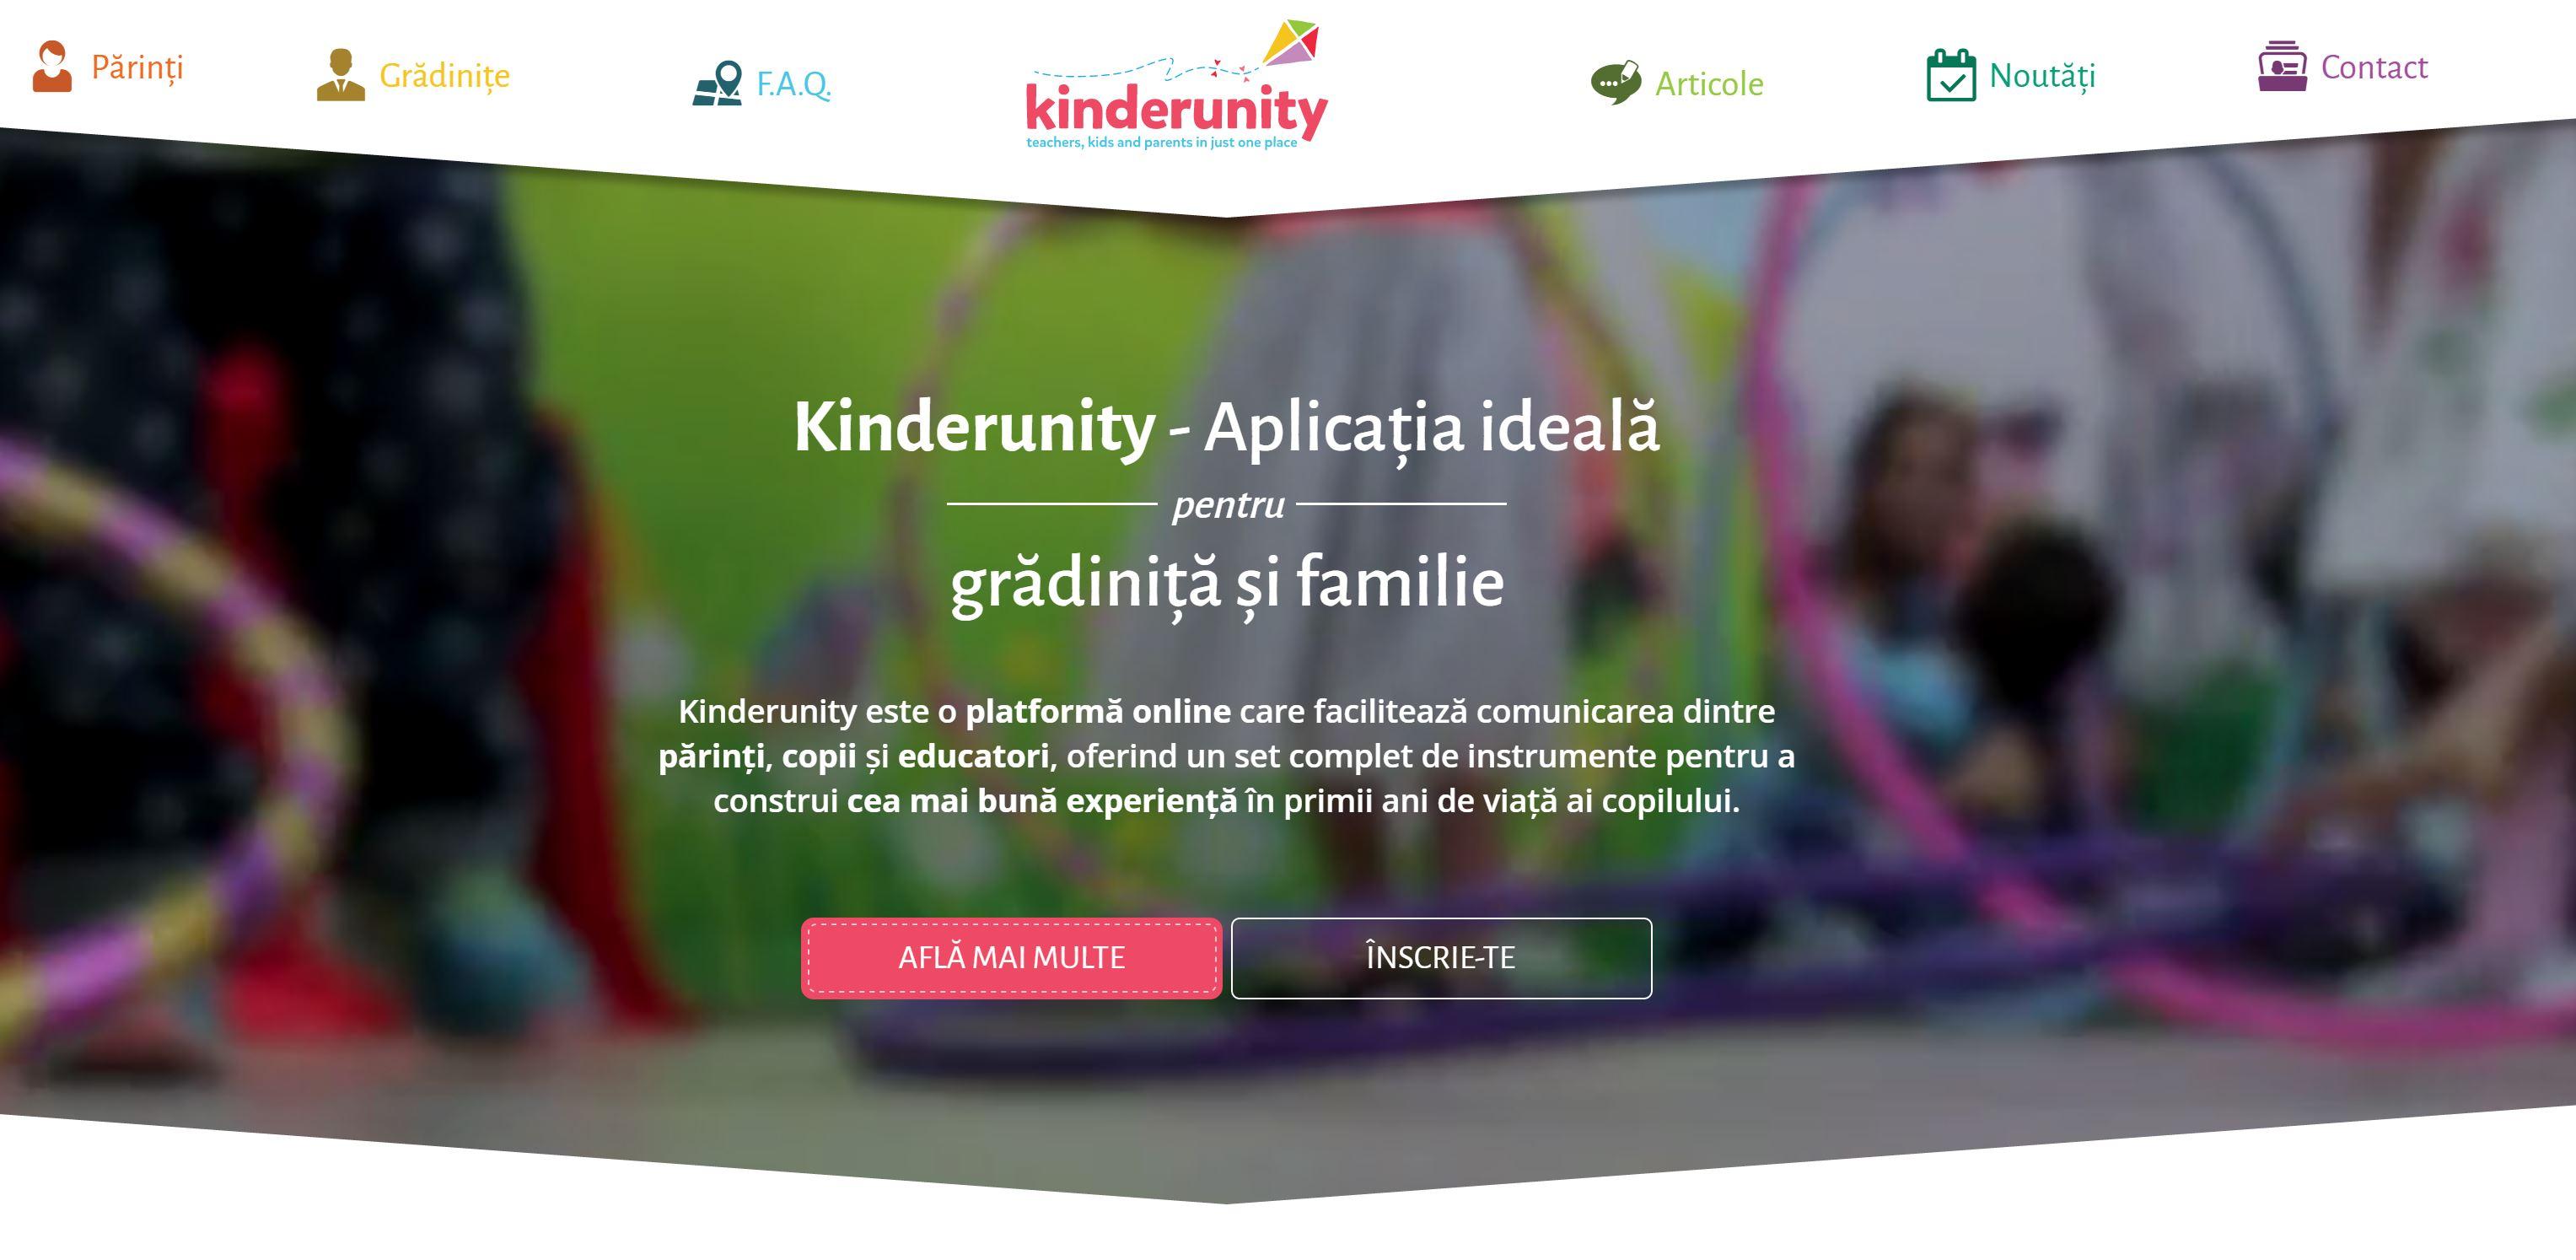 Kinderunity gradinita